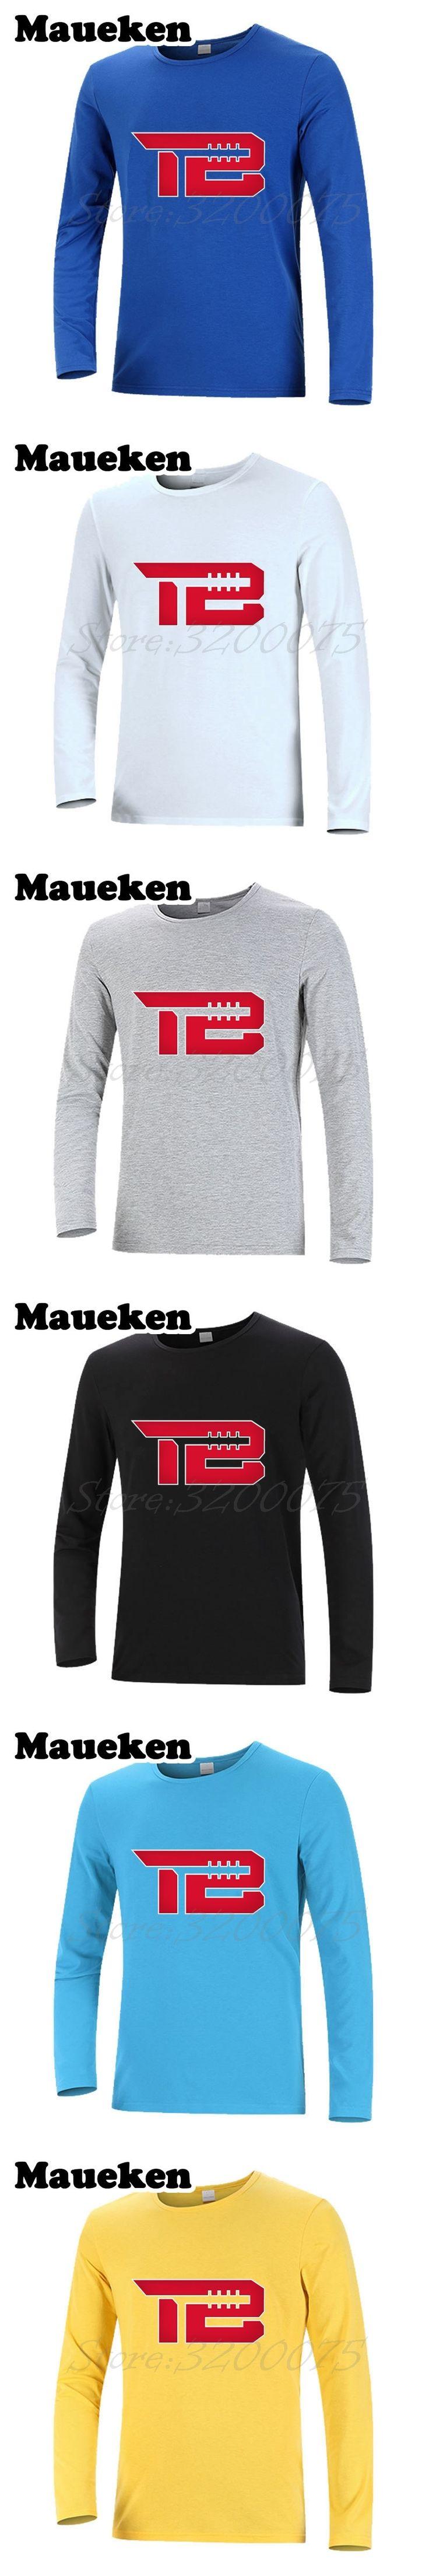 Men Autumn Winter #12 Tom Brady TB Logo New England T-Shirt Long Sleeve Tees T SHIRT Men's Fashion W1031010